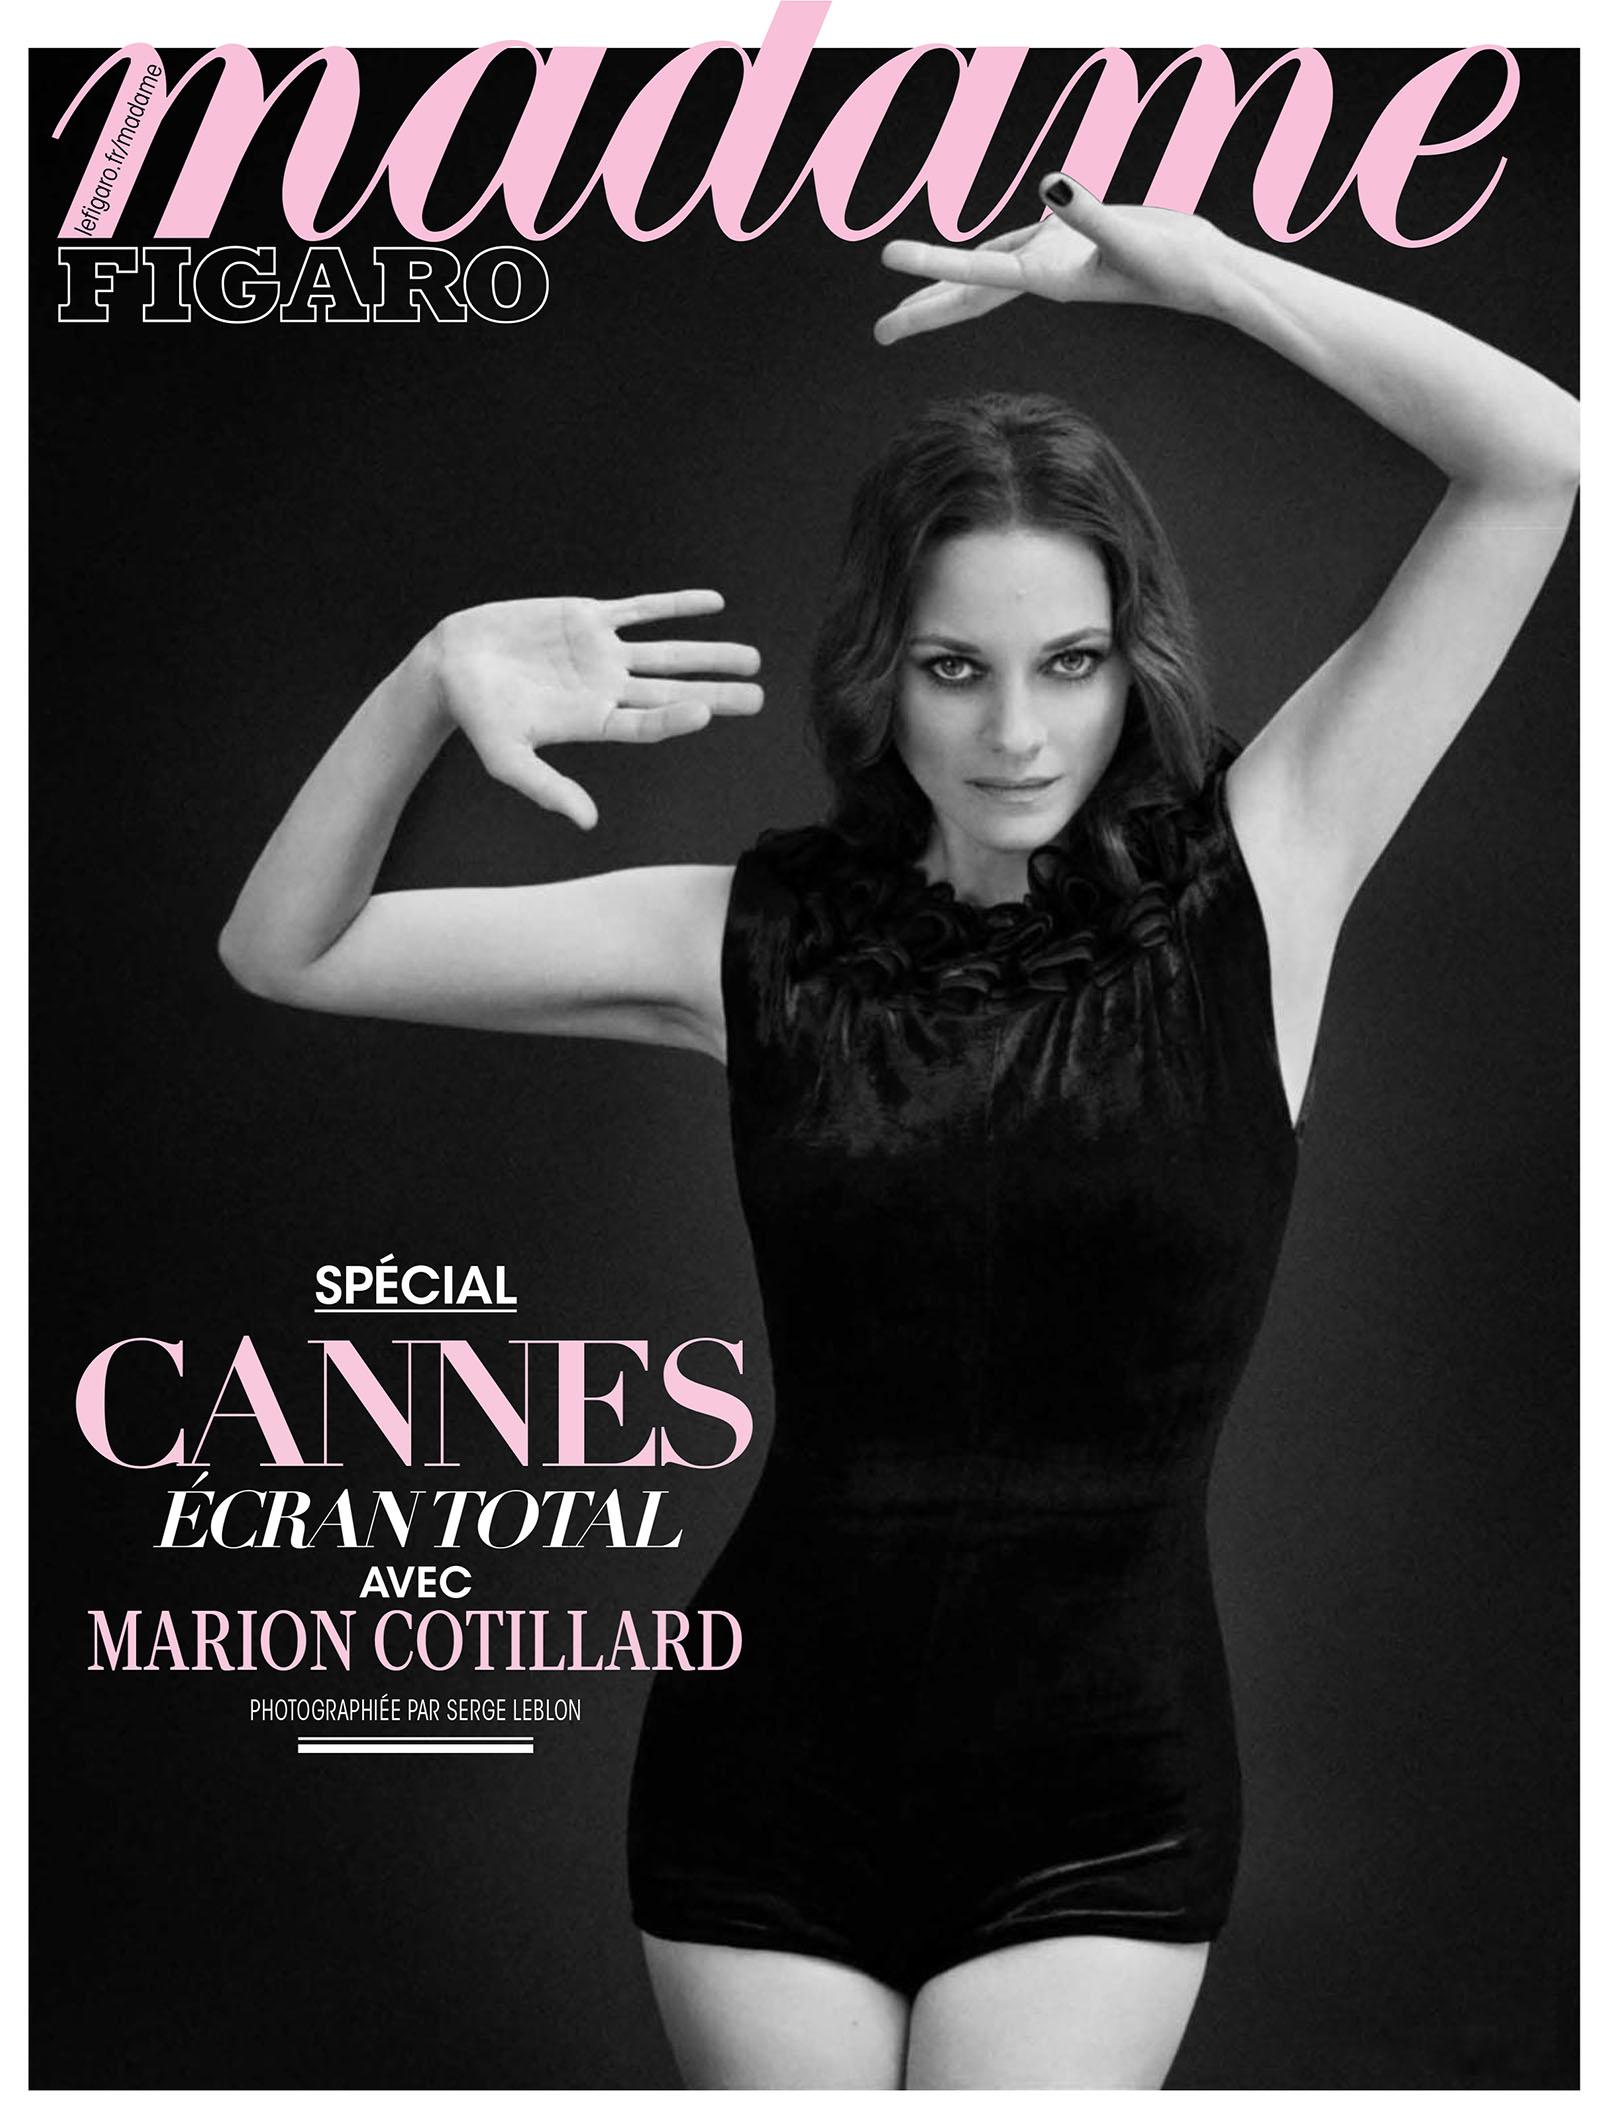 Marion Cotillard covers Madame Figaro July 2nd, 2021 by Serge Leblon